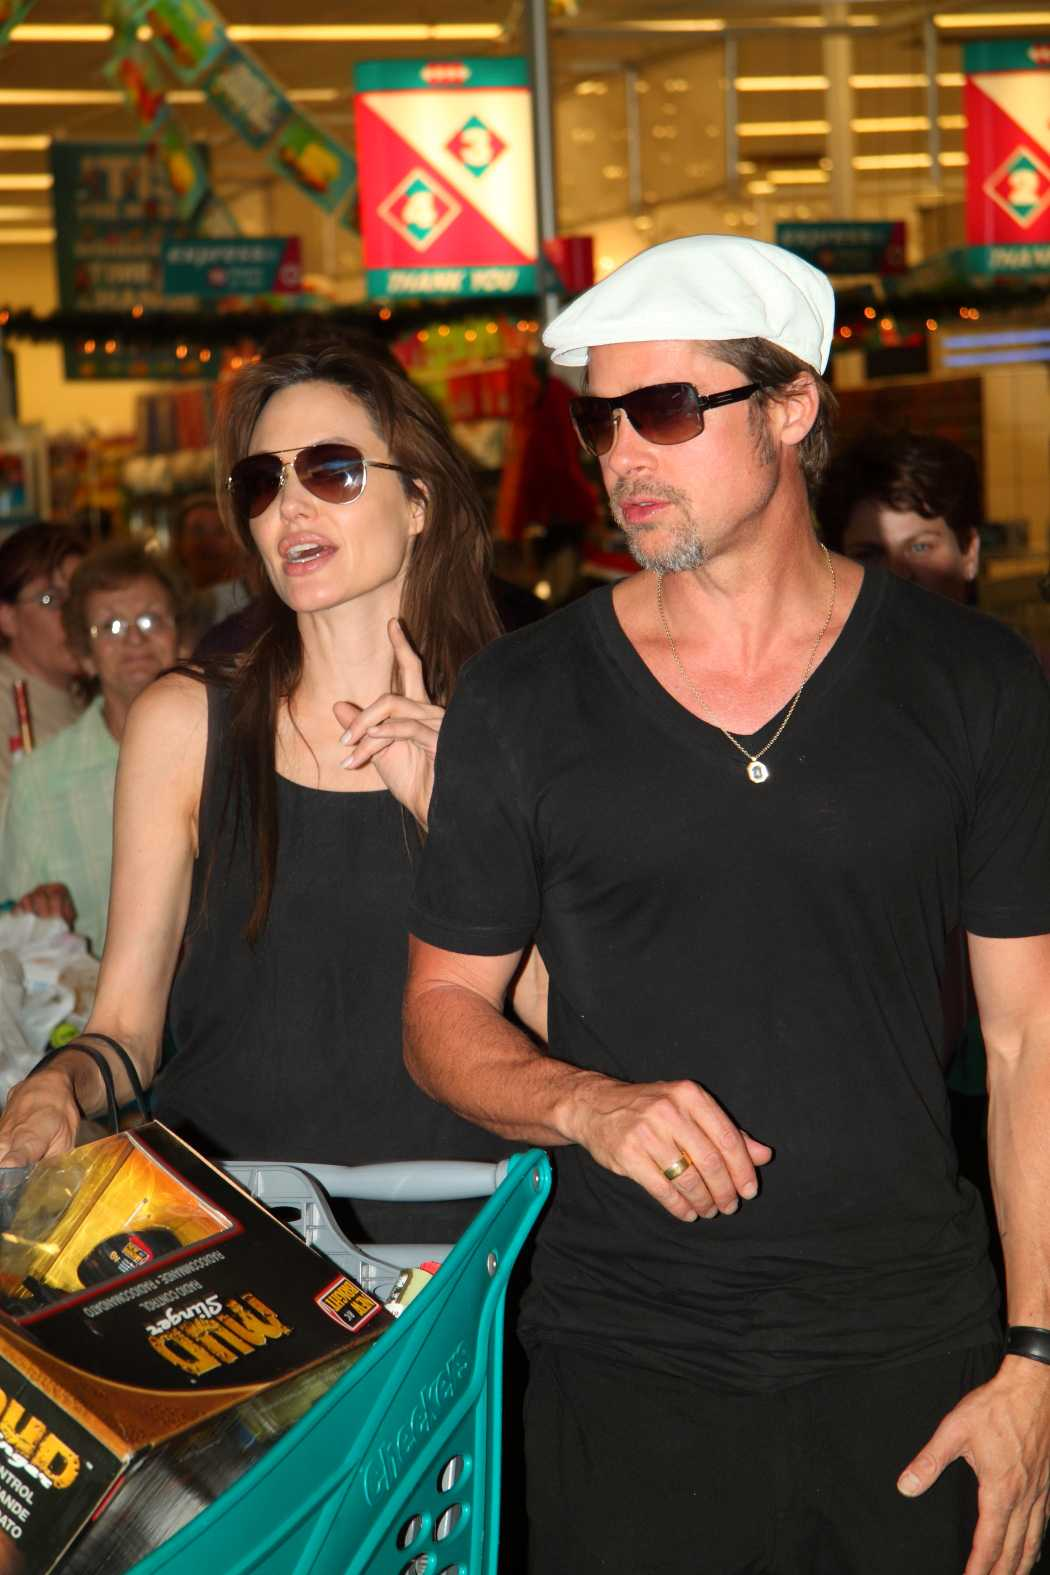 JUL I NAMIBIA Angelina Jolie och Brad Pitt julshoppar i Namibia.